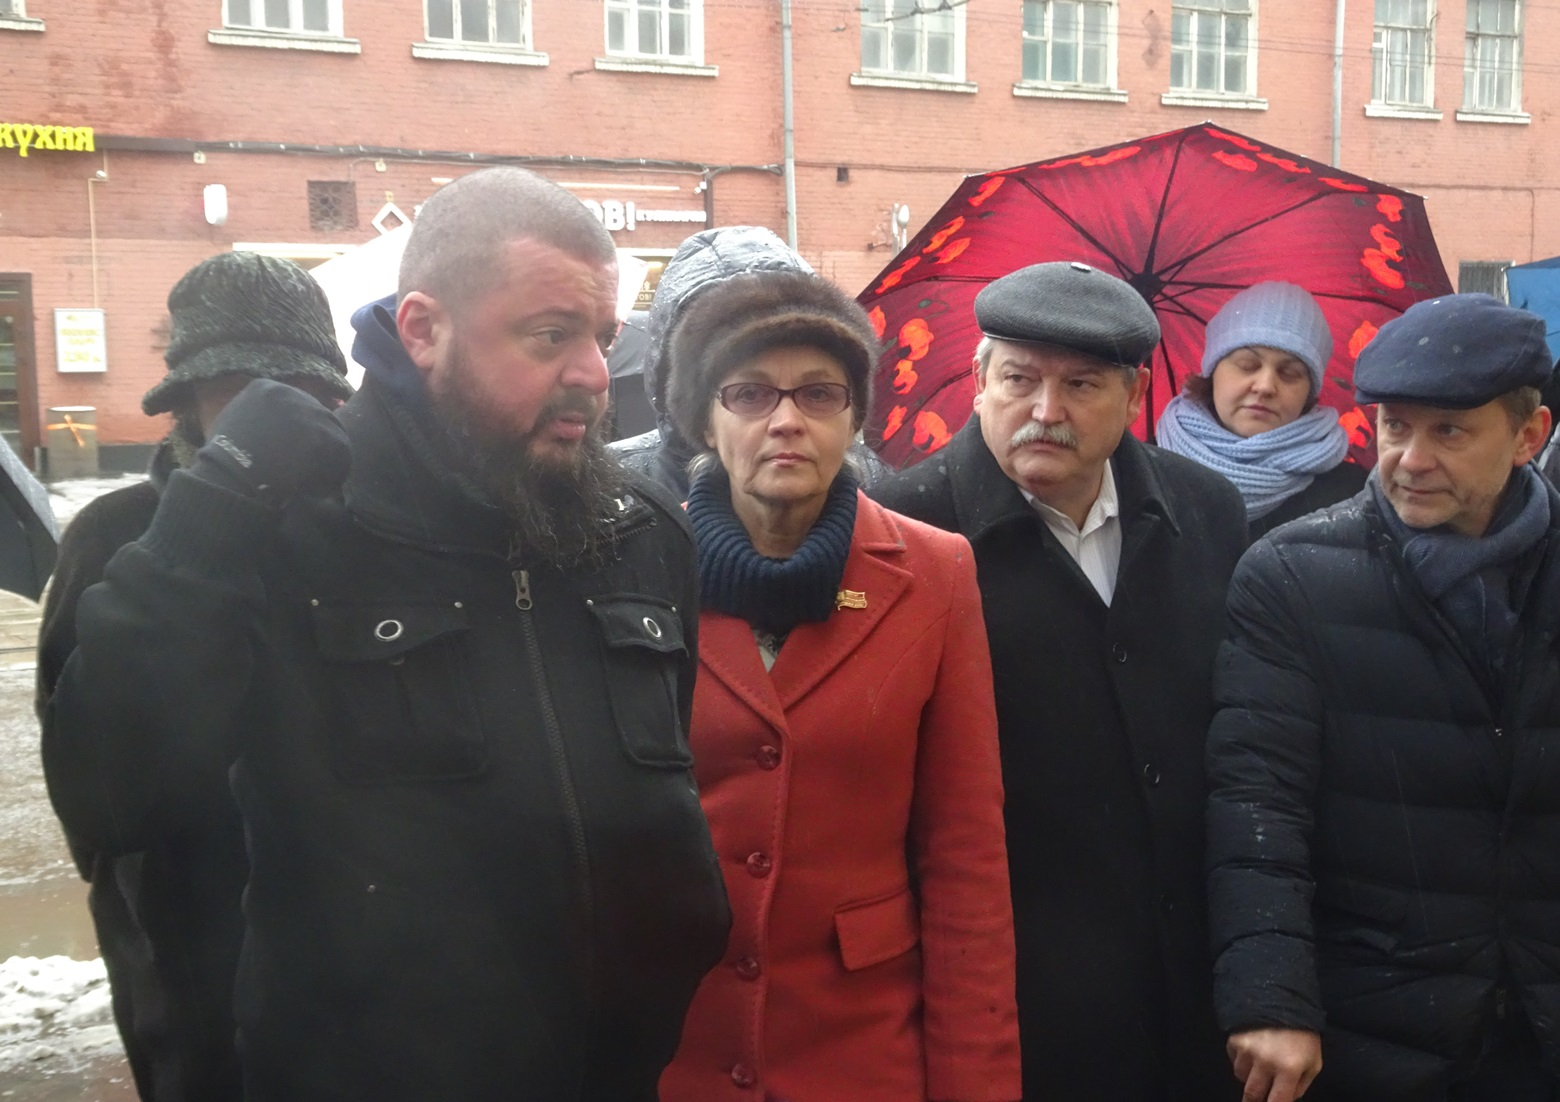 Буравкин, Шувалова, Кудряшов, Корнеев